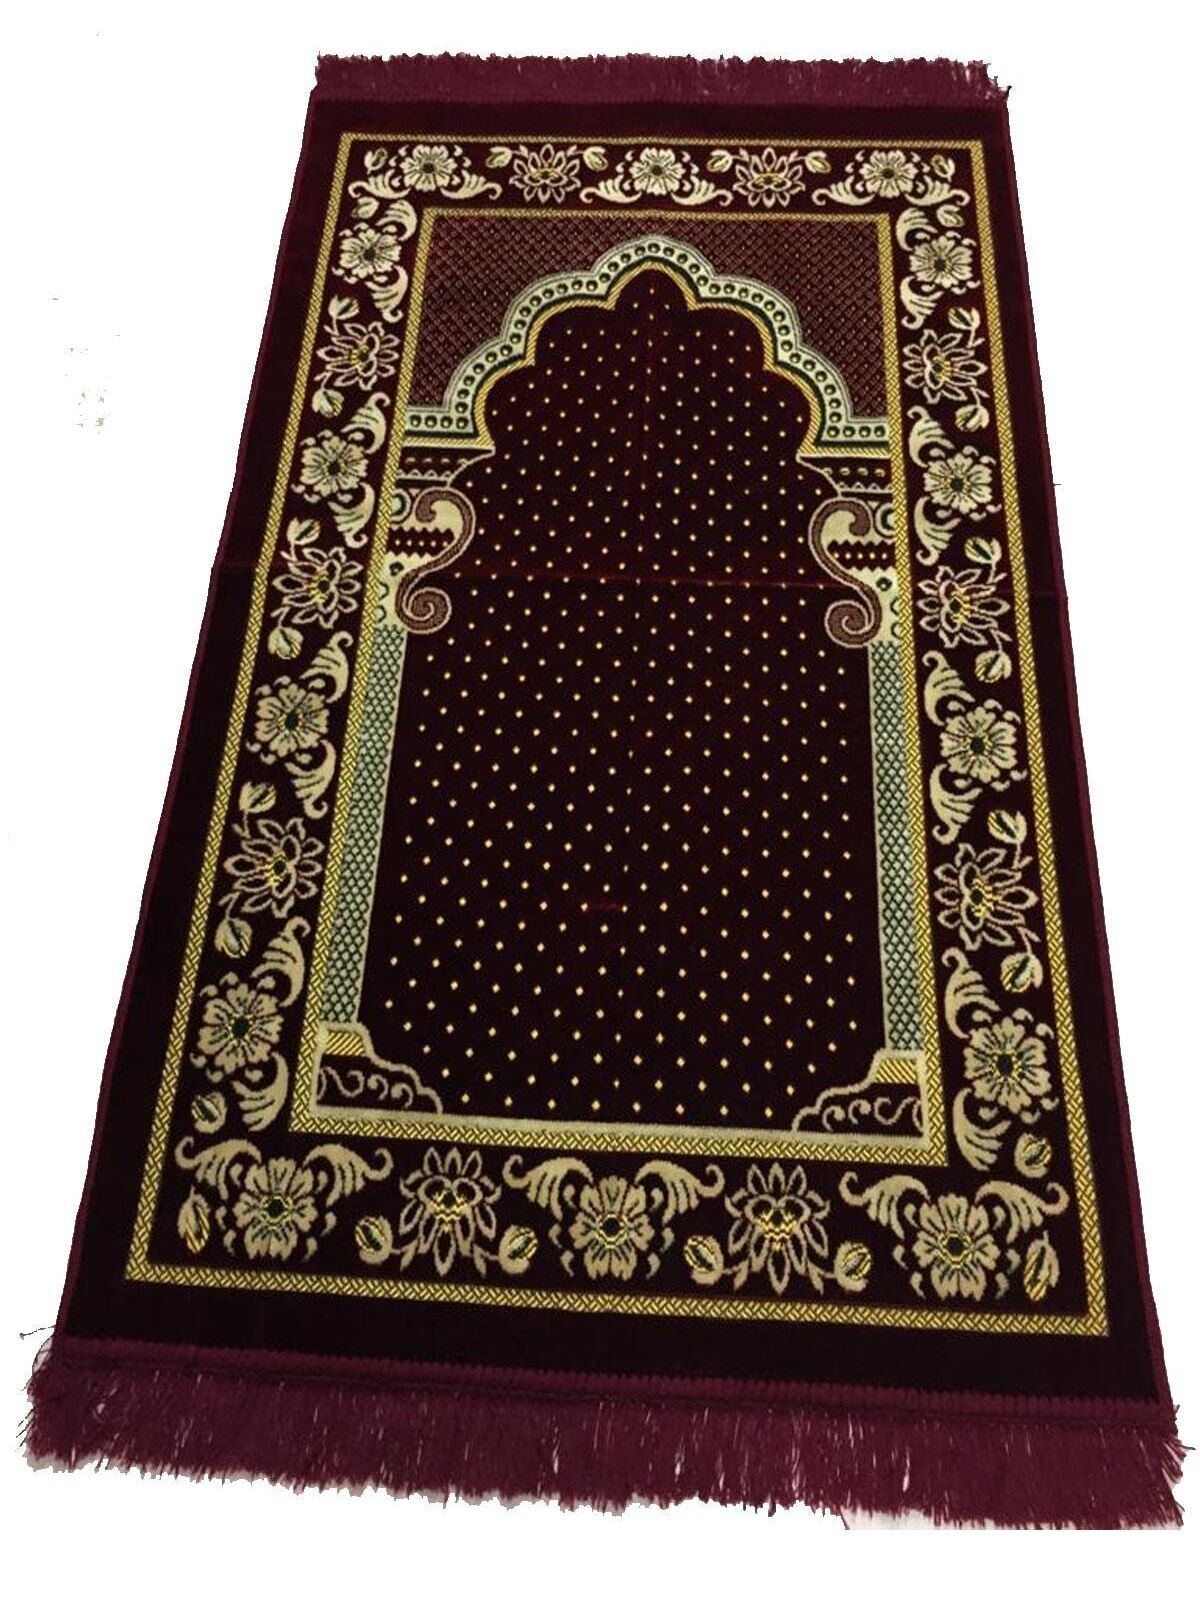 70 x 110 Velvet Prayer Mat Rug Muslim Prayer Carpet Gift Burgundy Blue Green Dark Blue Brown Hadj Sajjadah